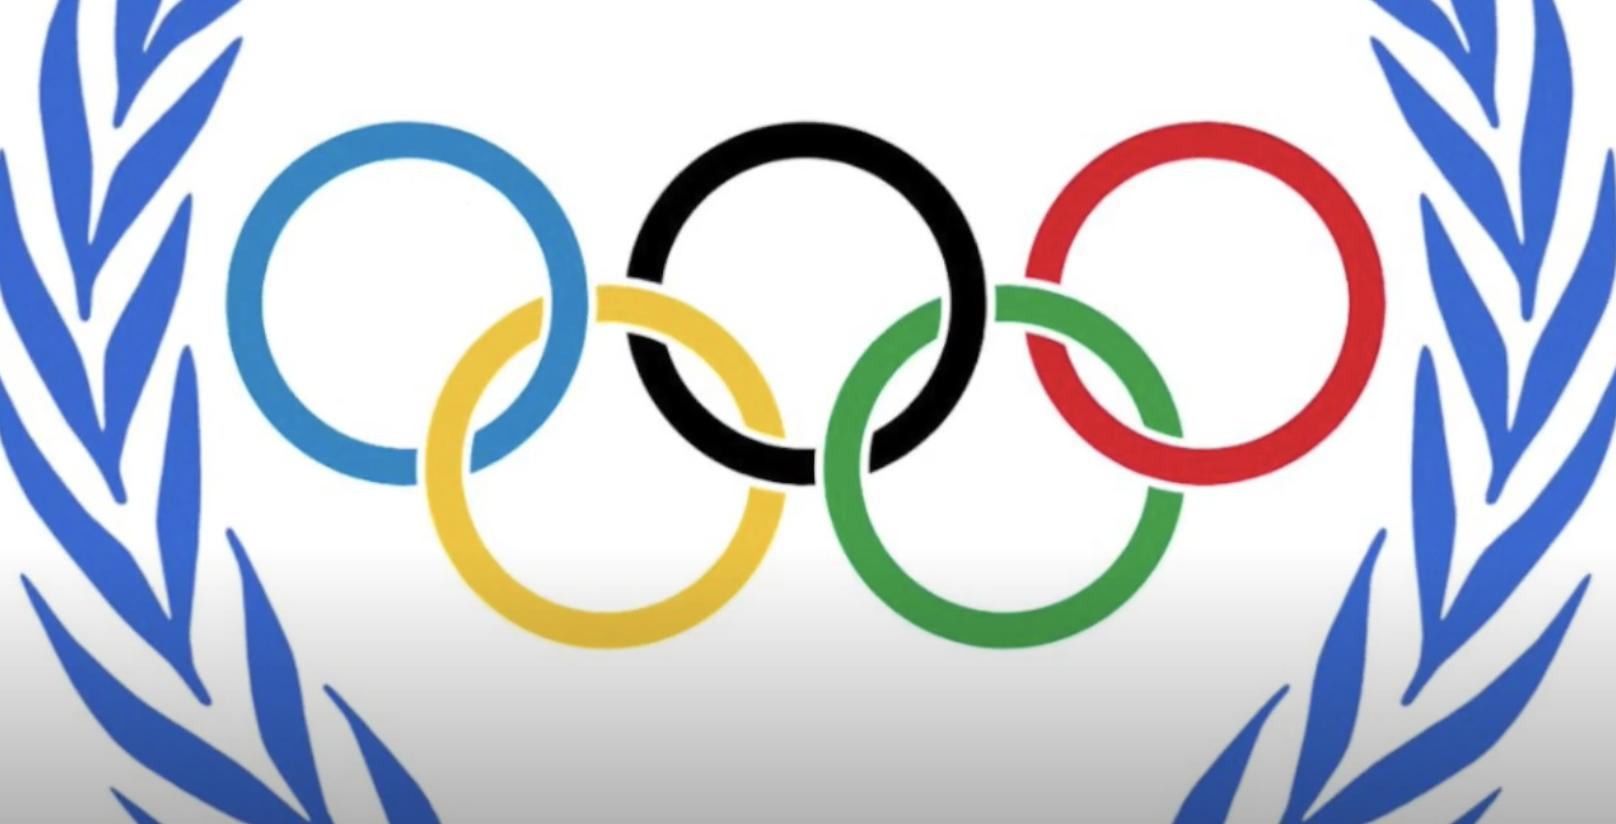 Trafalgar House Olympics